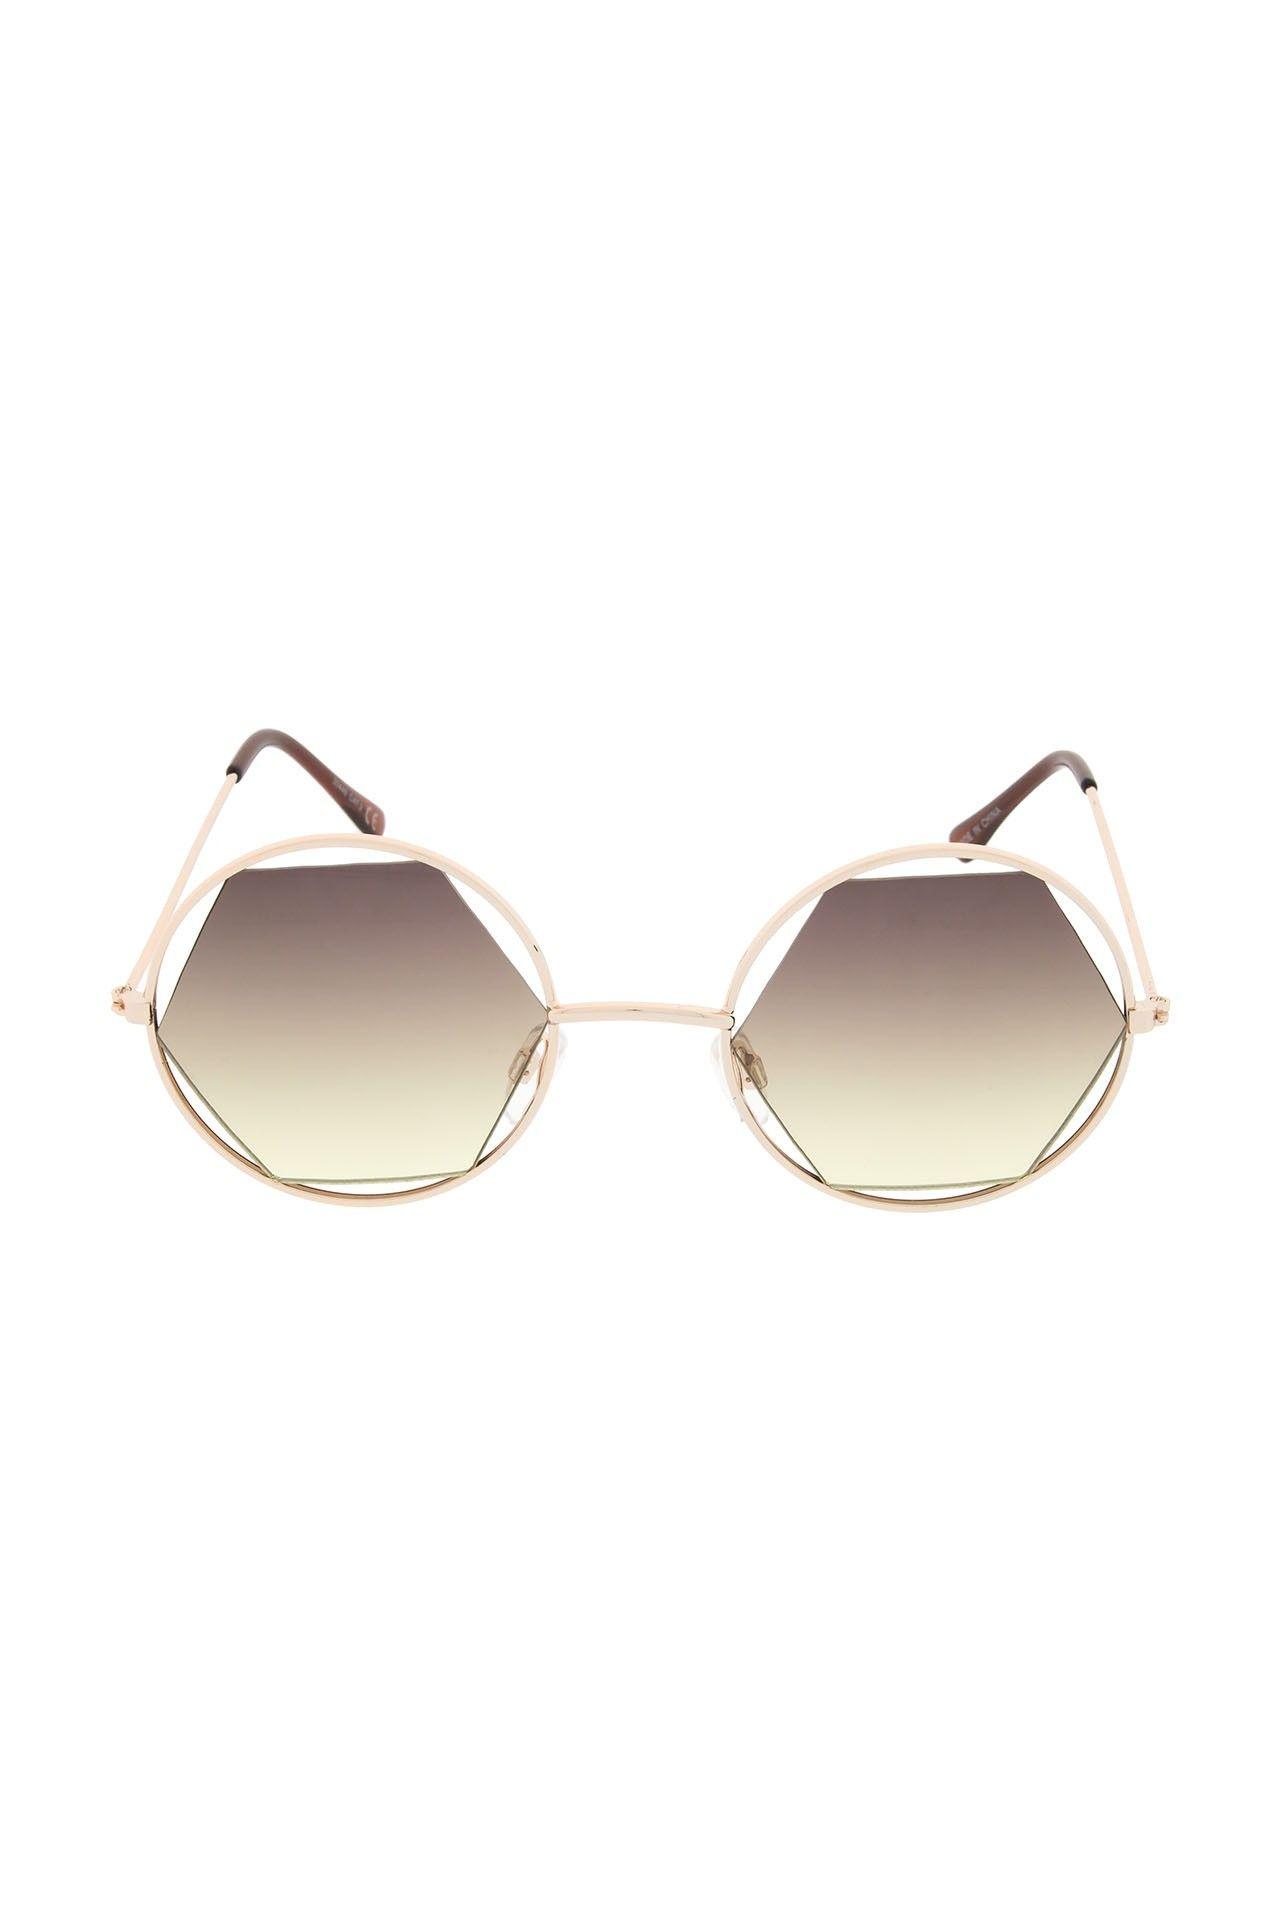 Afbeelding van Icon Eyewear 30446 A Zonnebril Pale Gold